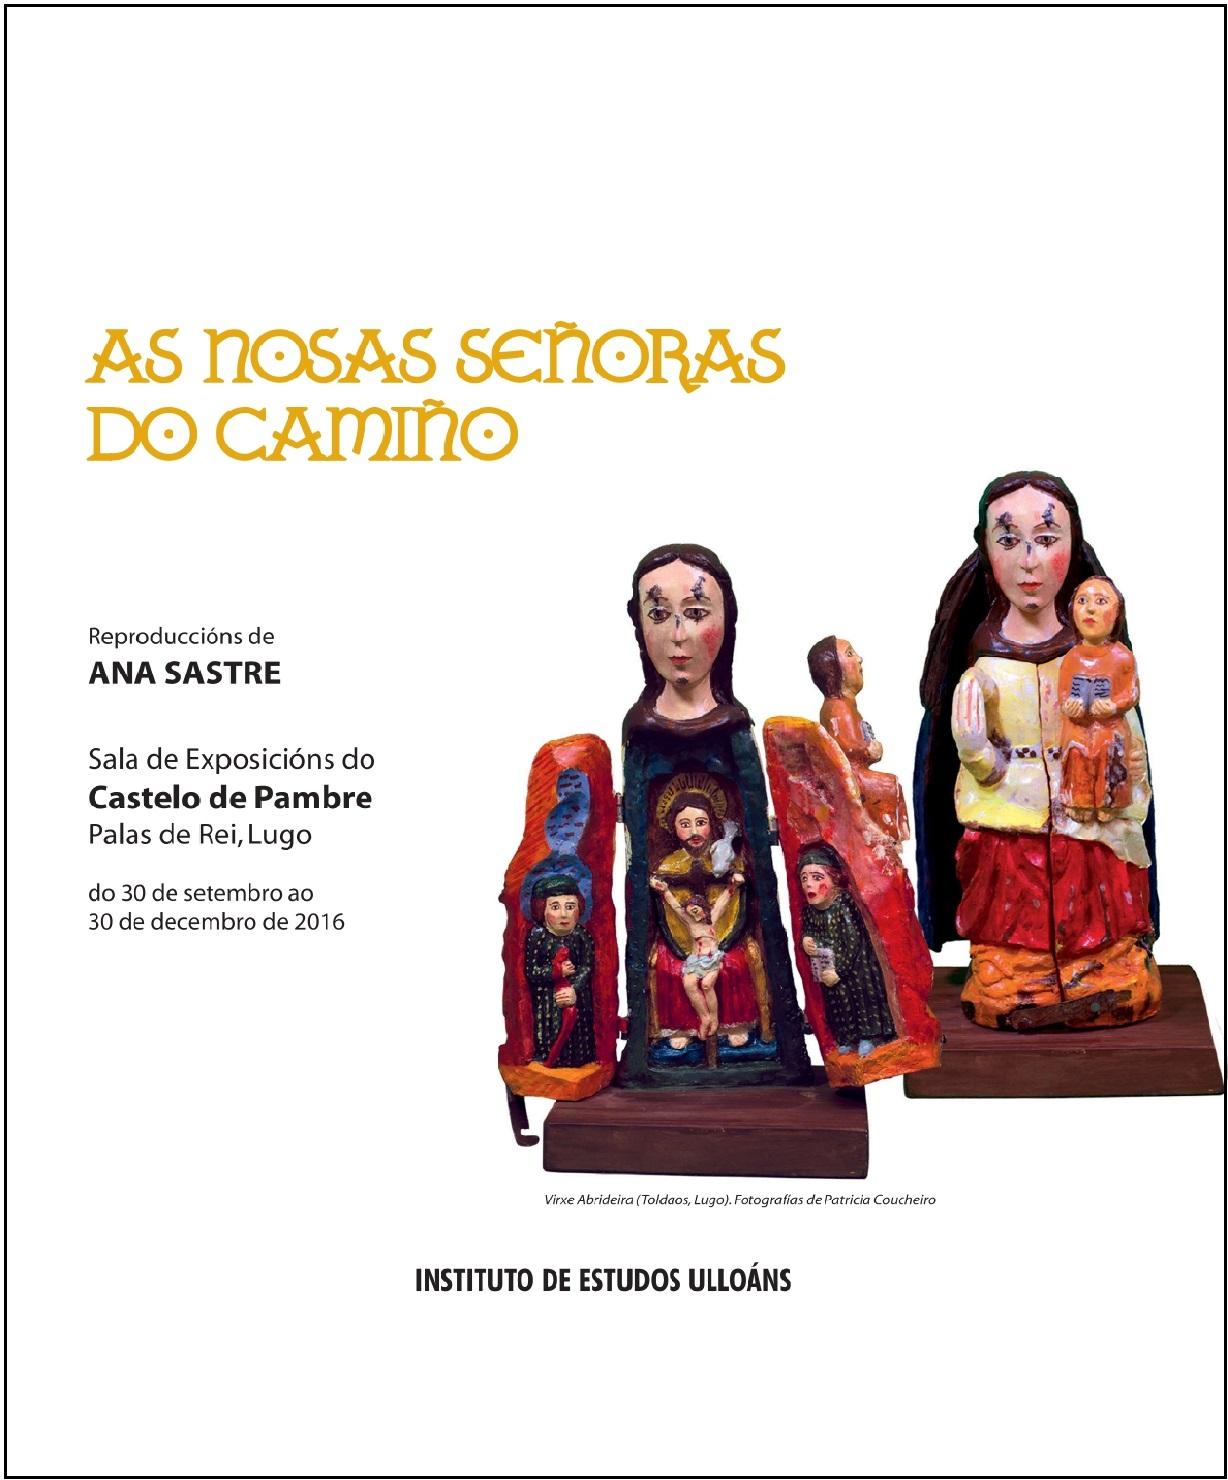 Portada Catálogo As Nosas Señoras do Camiño, Instituto de Estudos Ulloáns